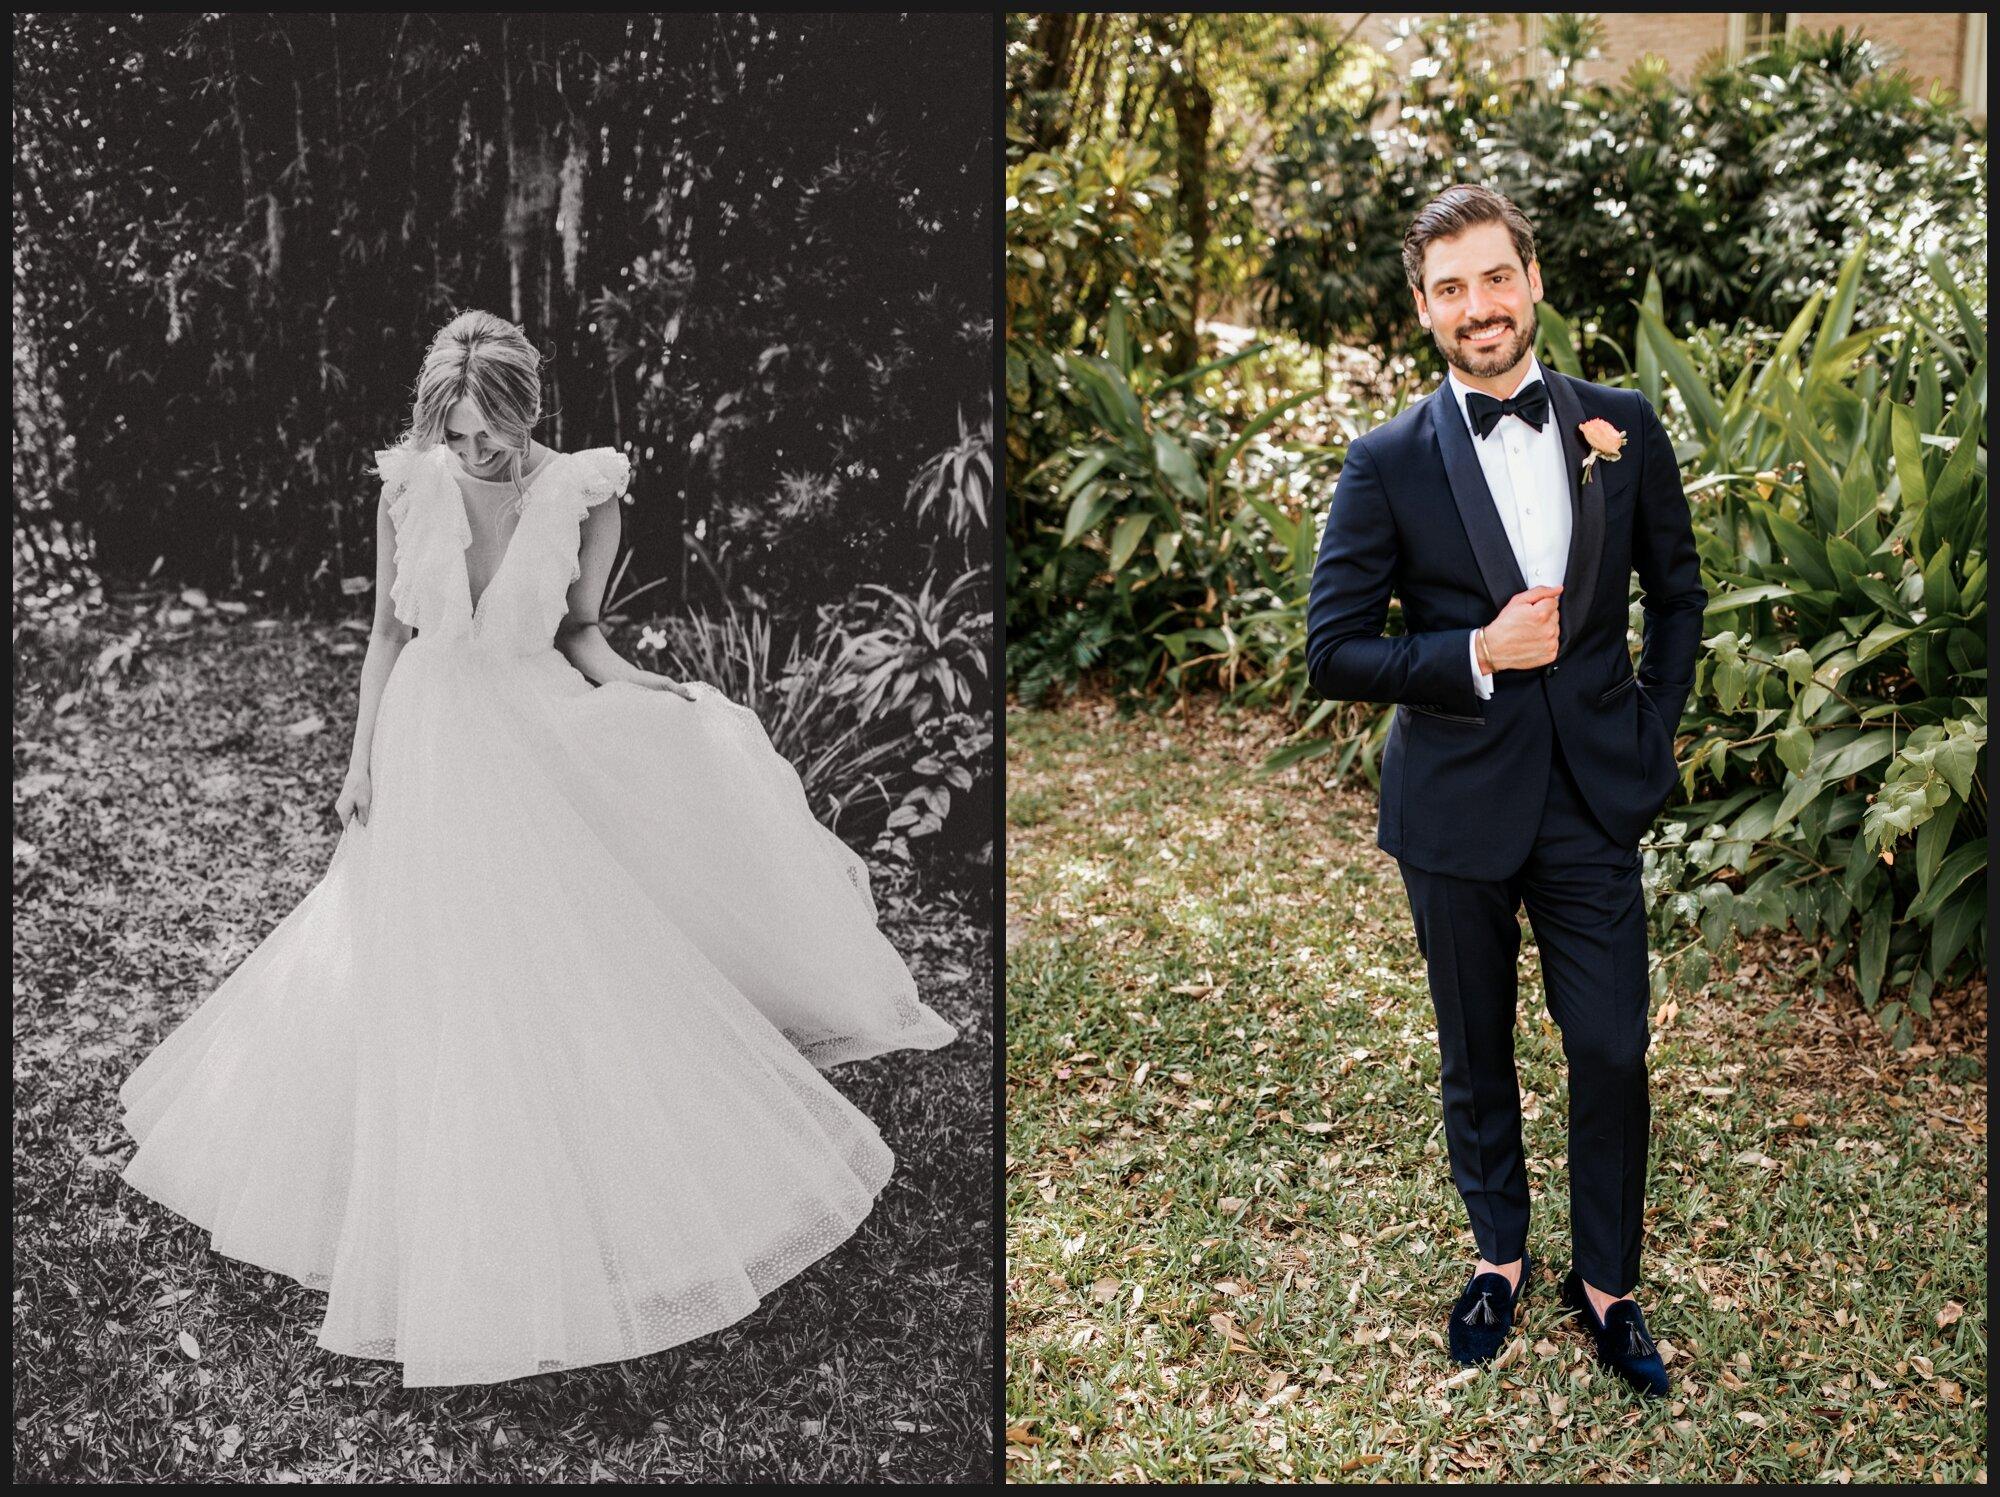 Orlando-Wedding-Photographer-destination-wedding-photographer-florida-wedding-photographer-hawaii-wedding-photographer_0703.jpg